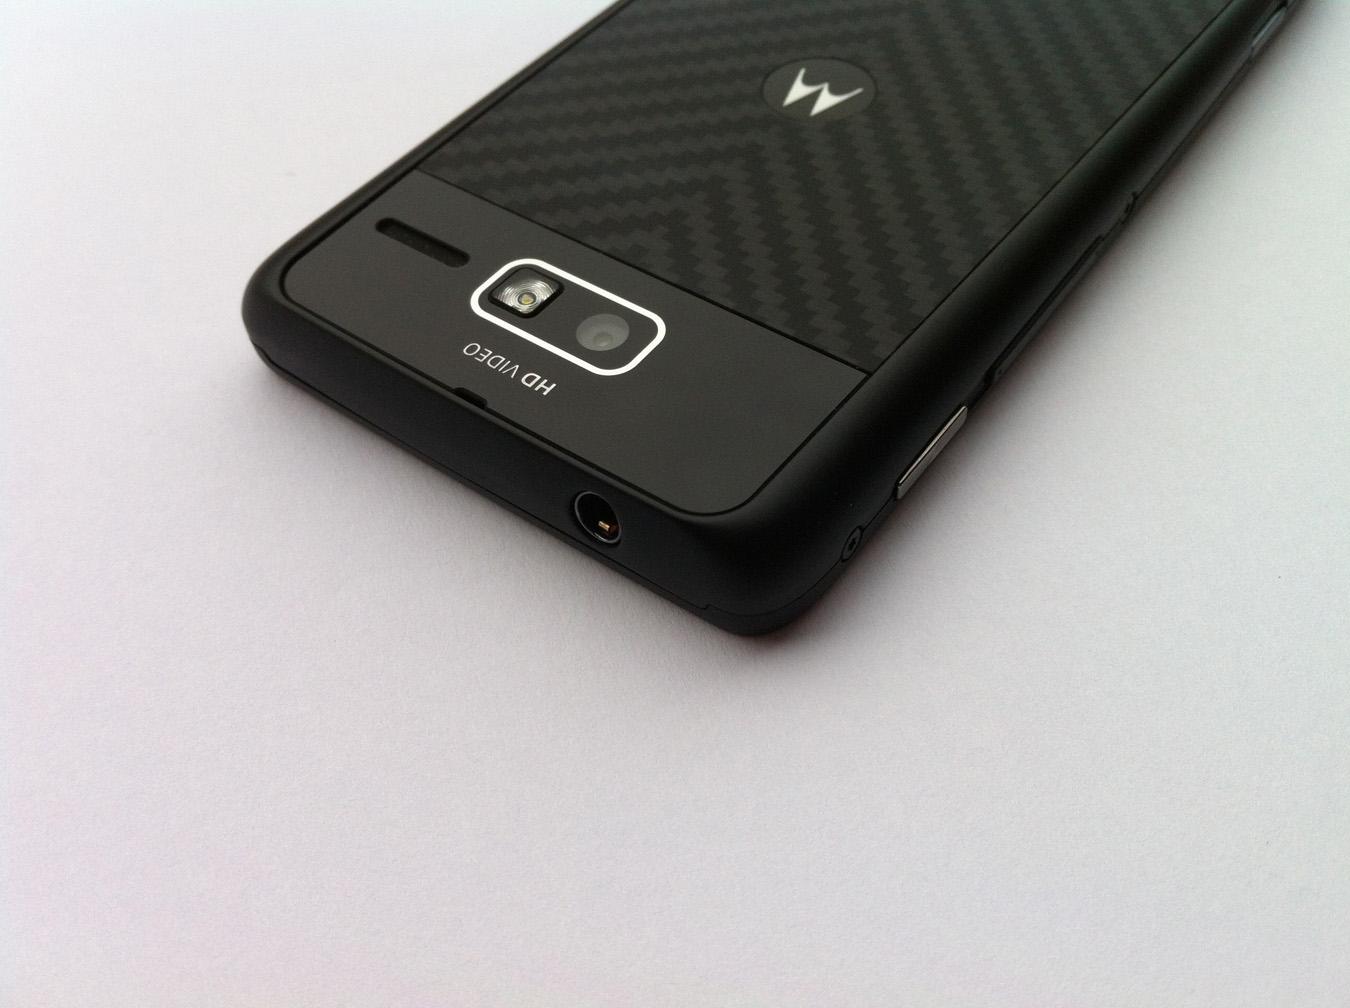 Test: Motorola Razr i - powered by Intel